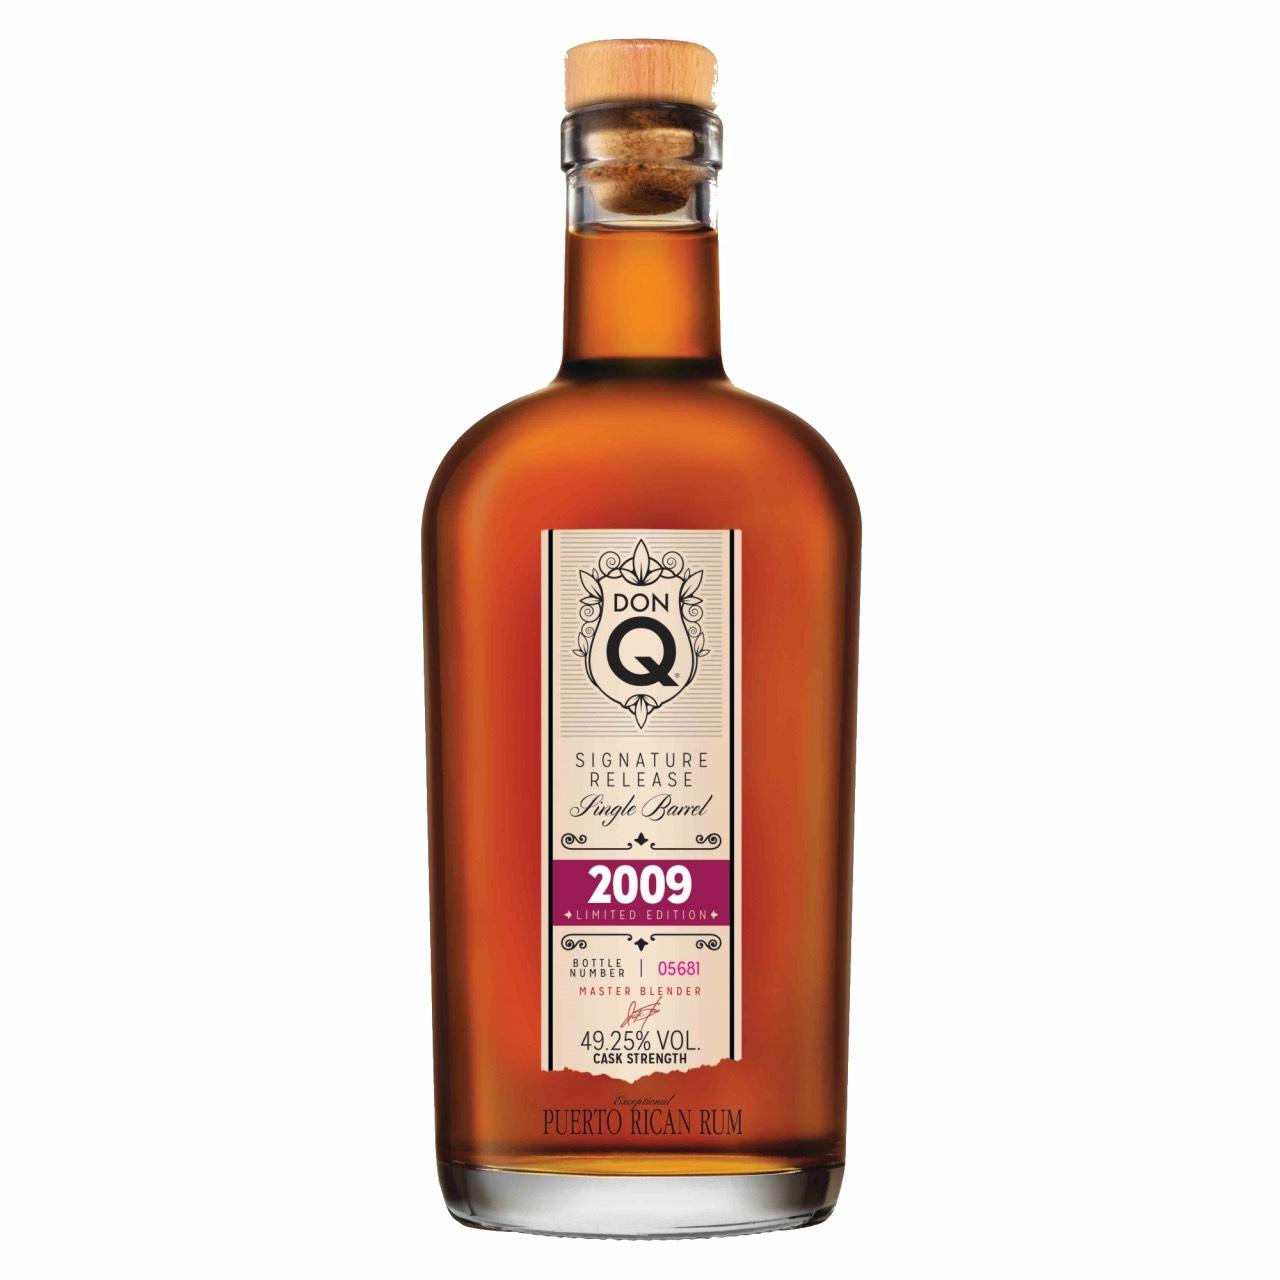 Bottle image of Don Q Single Barrel